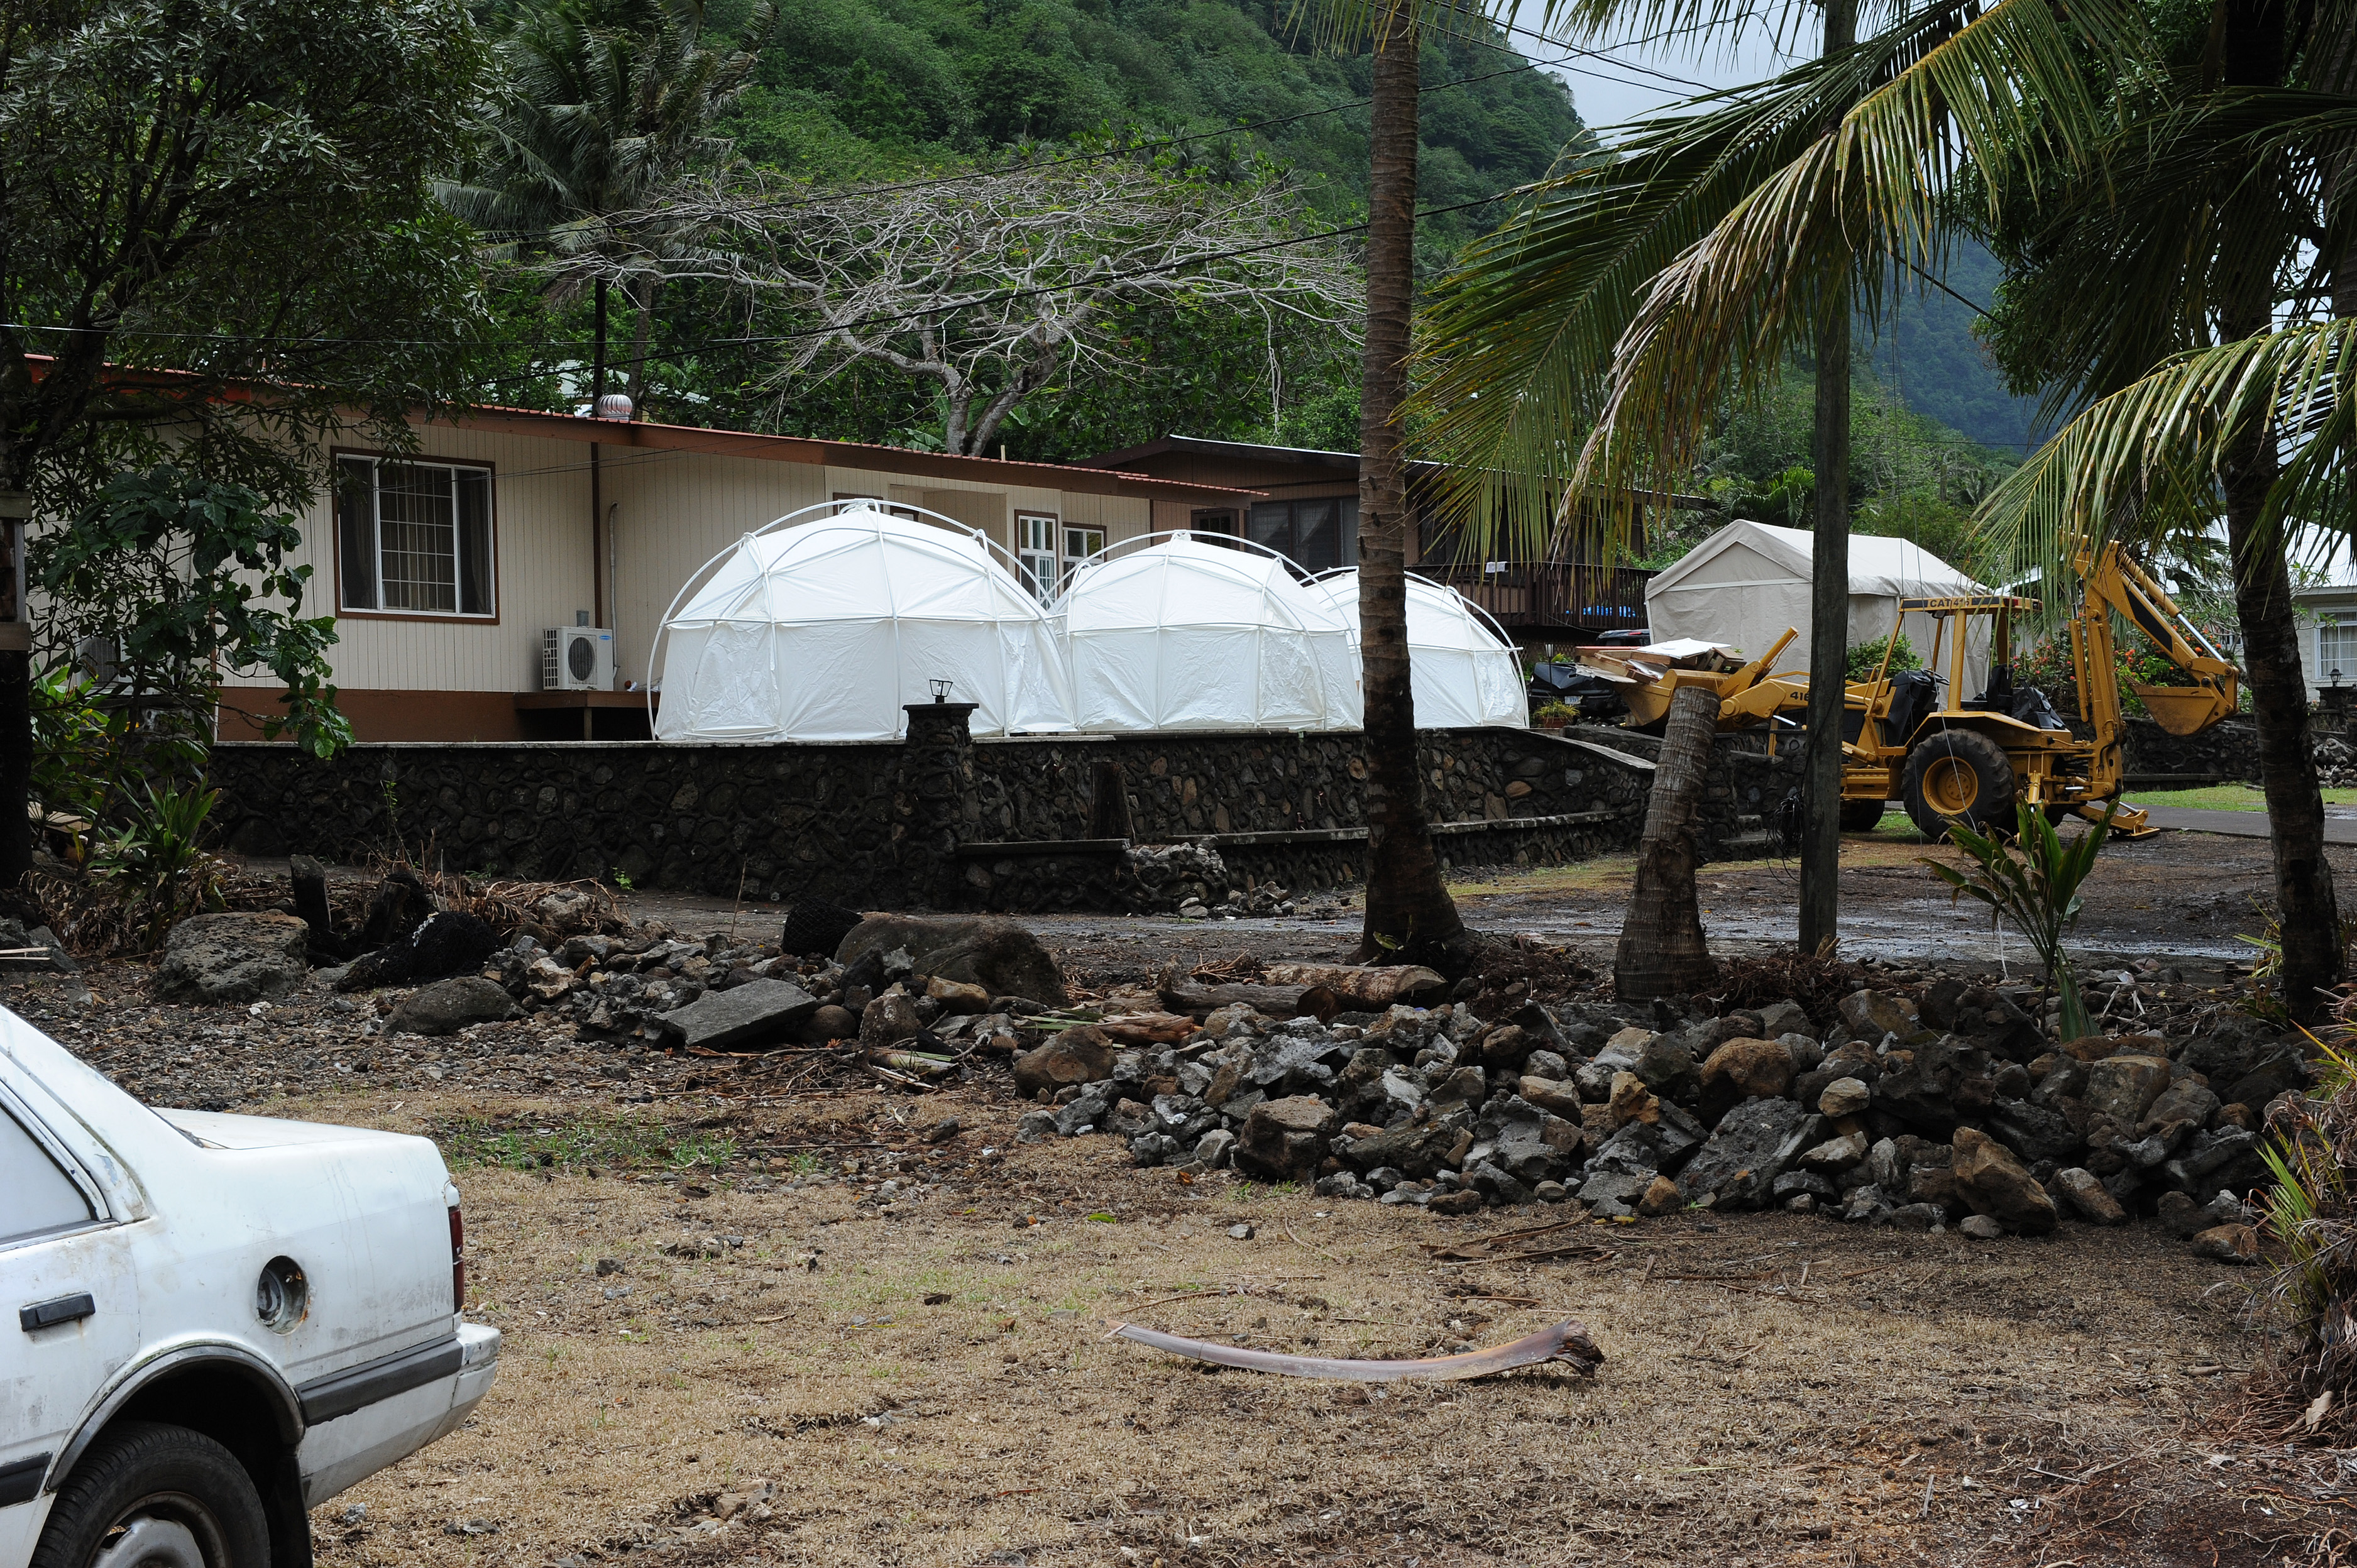 FileFEMA - 42244 - Three Federal Emergency Management Agency Tents in American Samoa. & File:FEMA - 42244 - Three Federal Emergency Management Agency ...